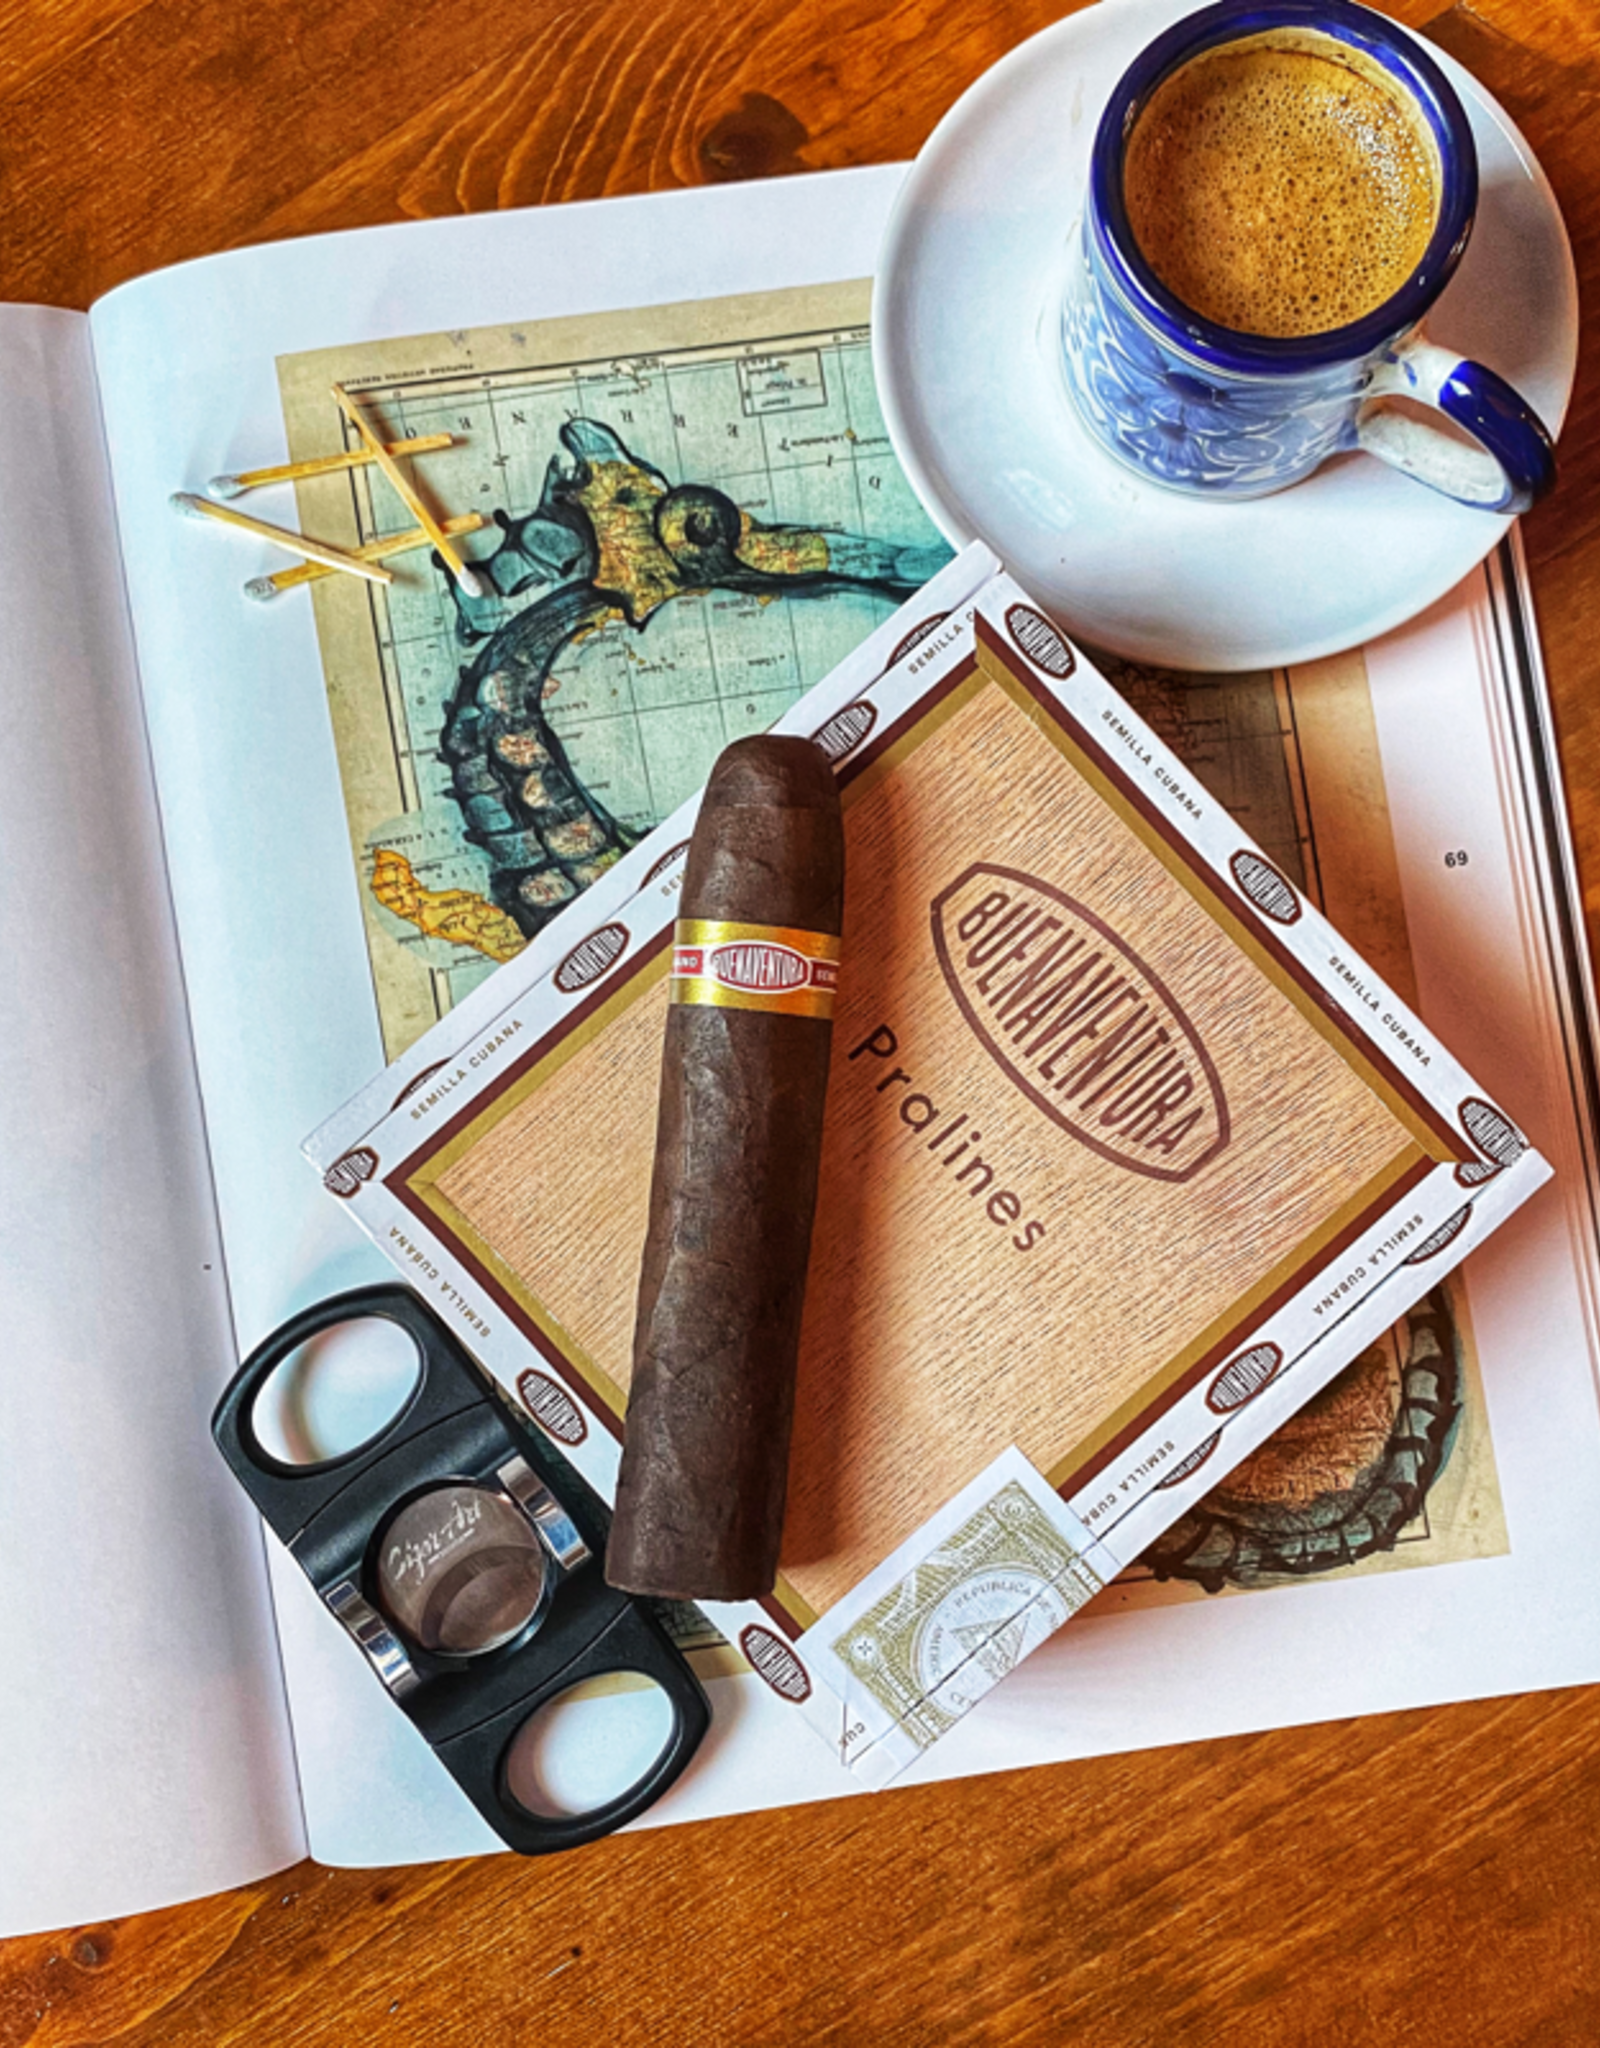 Curivari Cigars Buenaventura Pralines 460 BP Belicoso 4 x 60